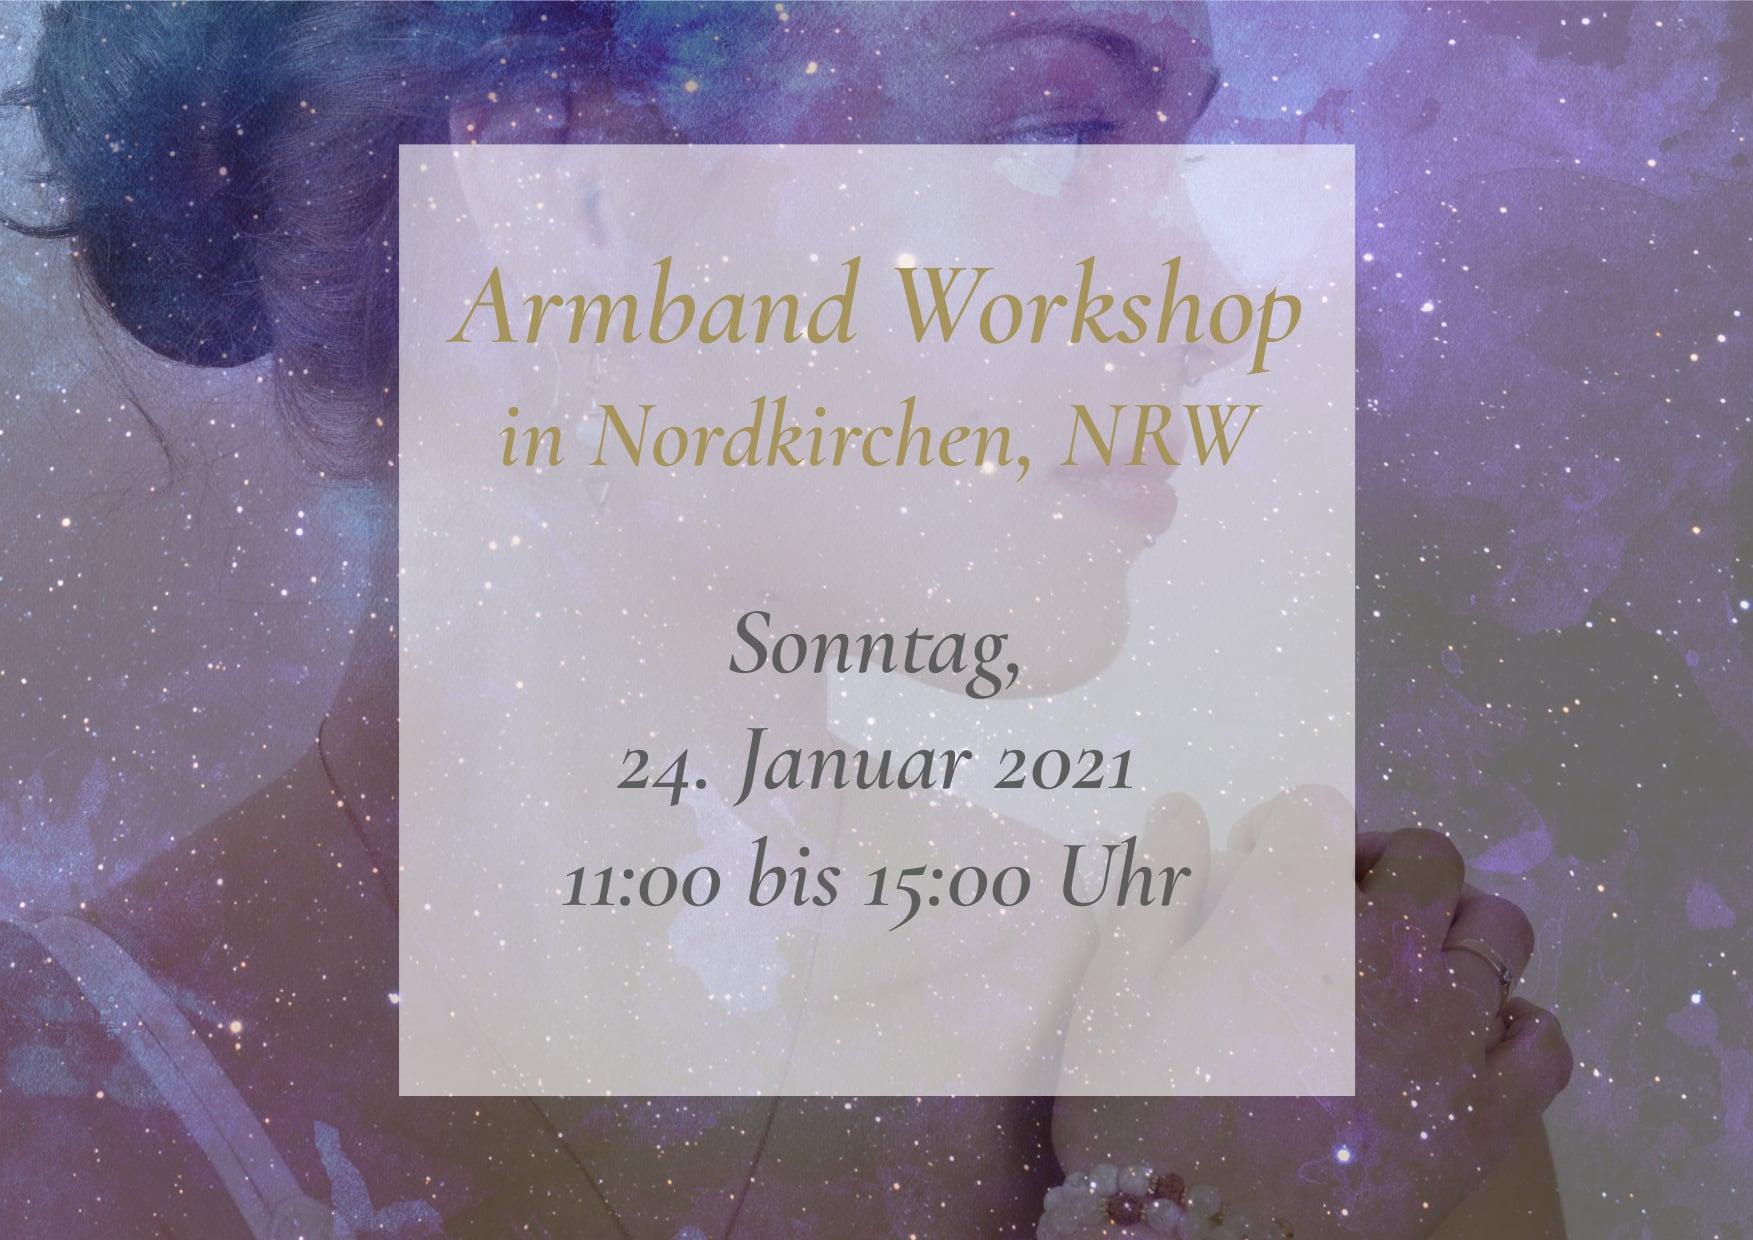 NW_Armband_WS_01_2021_Norkirchen_EN